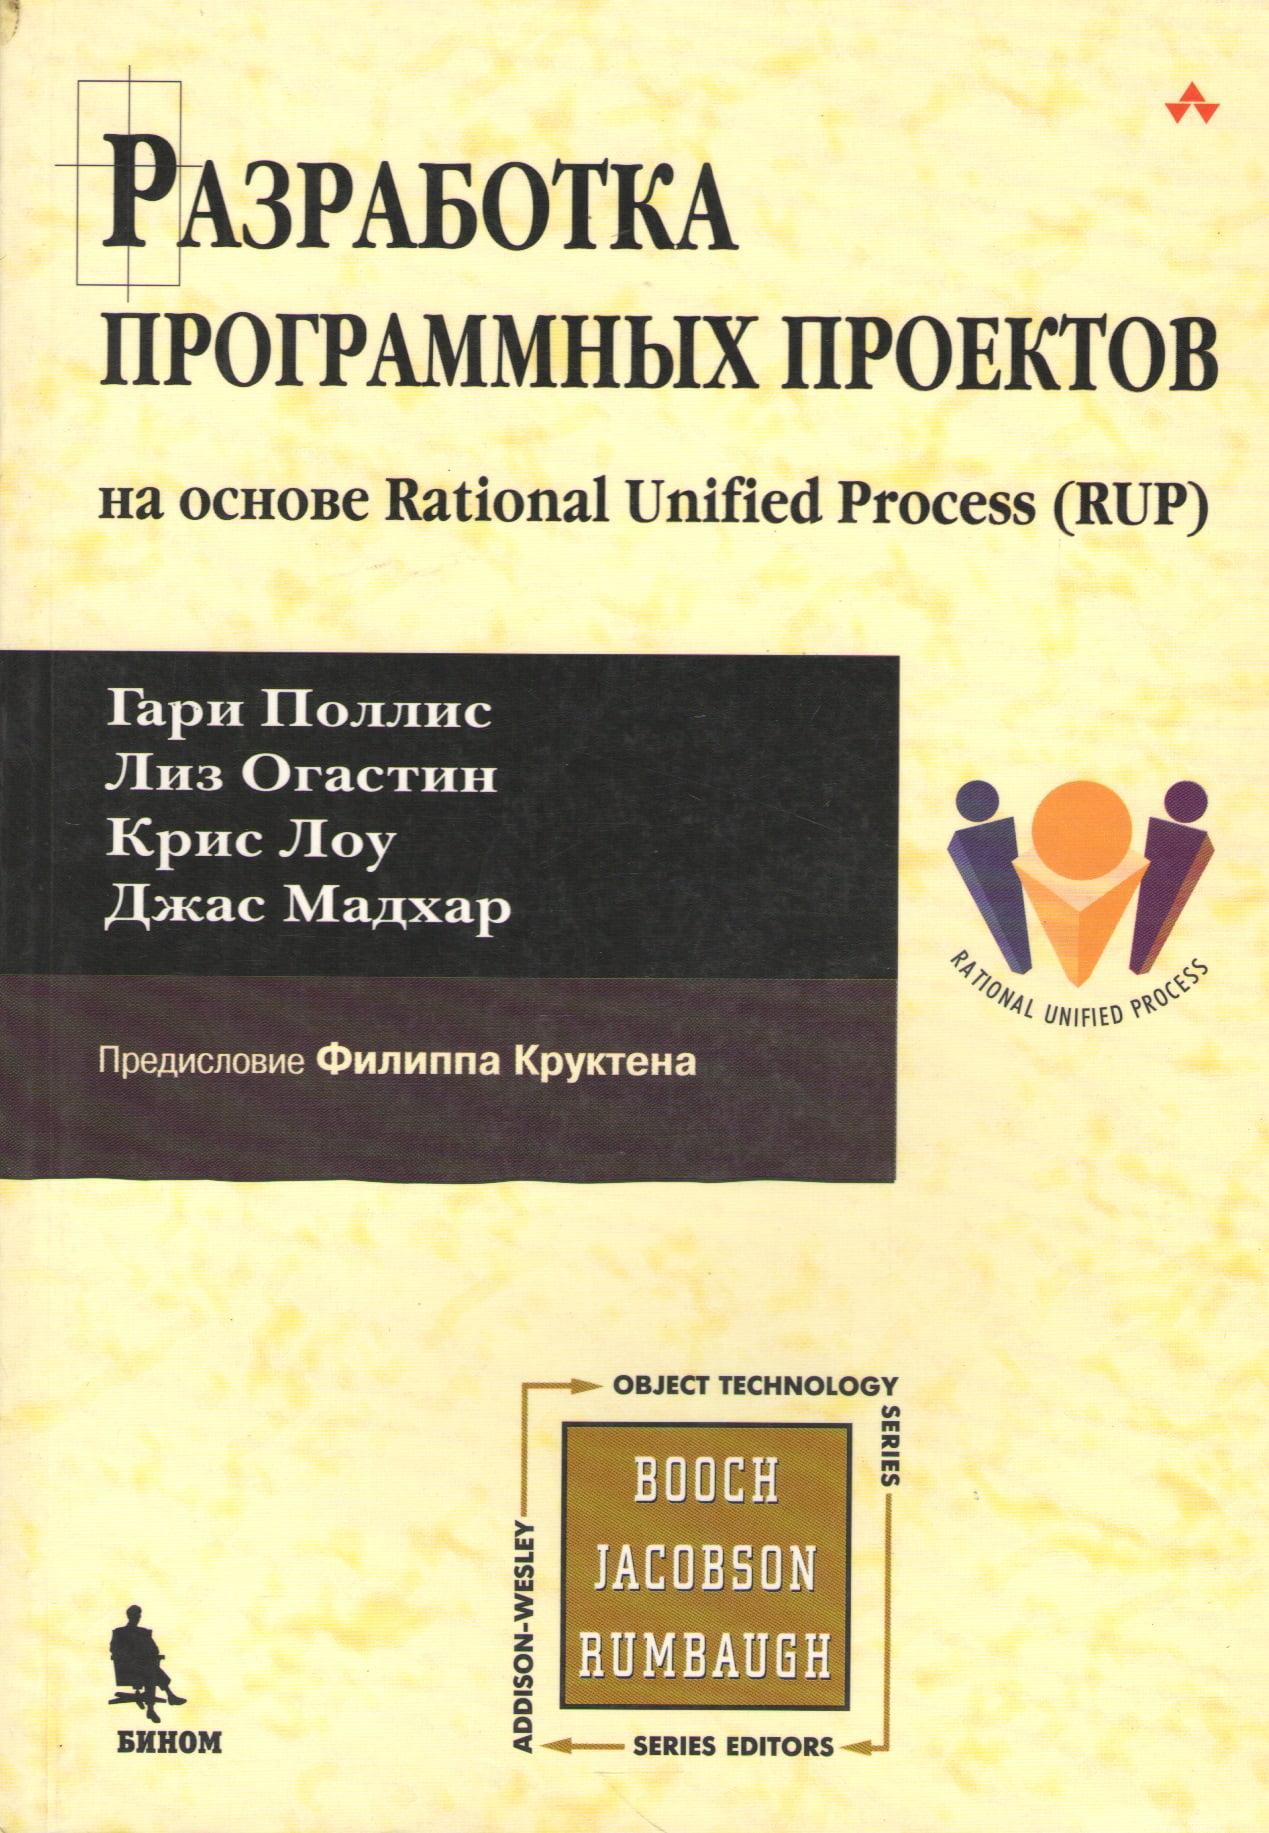 Разработка программных проектов. На основе Rational Unified Process (RUP) - фото 1